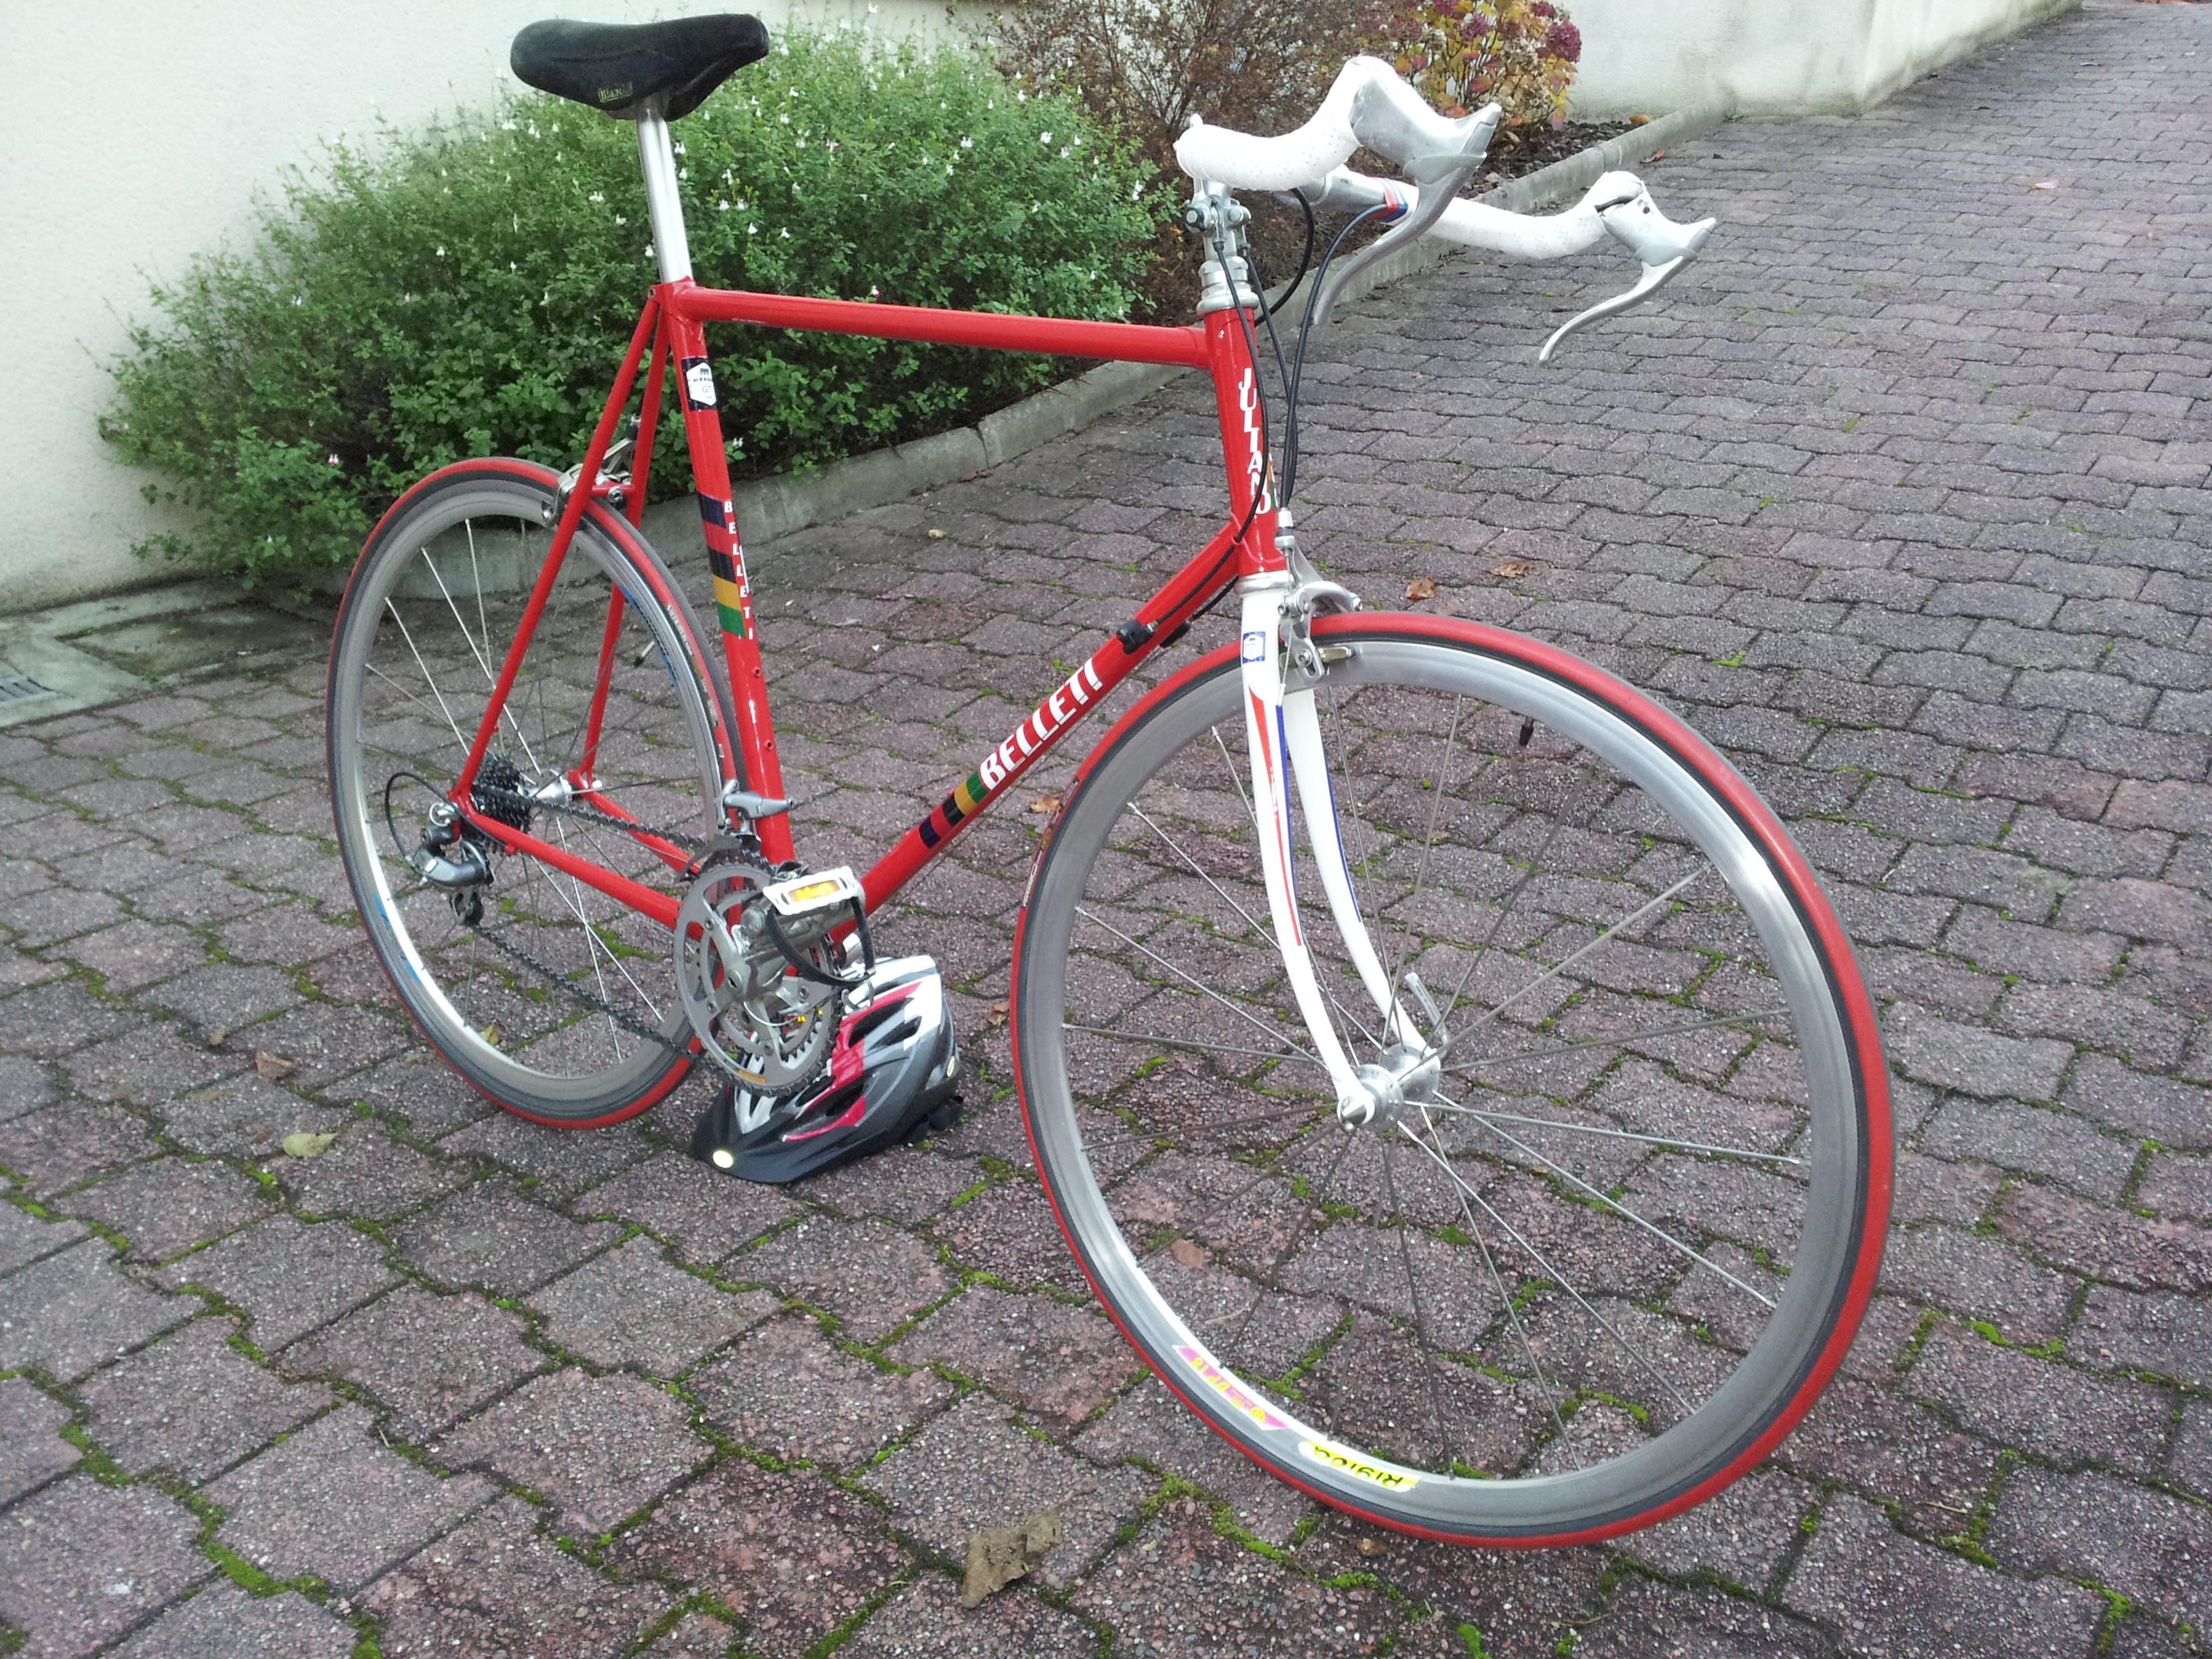 Le Belleti : Vélo perso - Vélotaf course - Page 2 131130054512612711779516